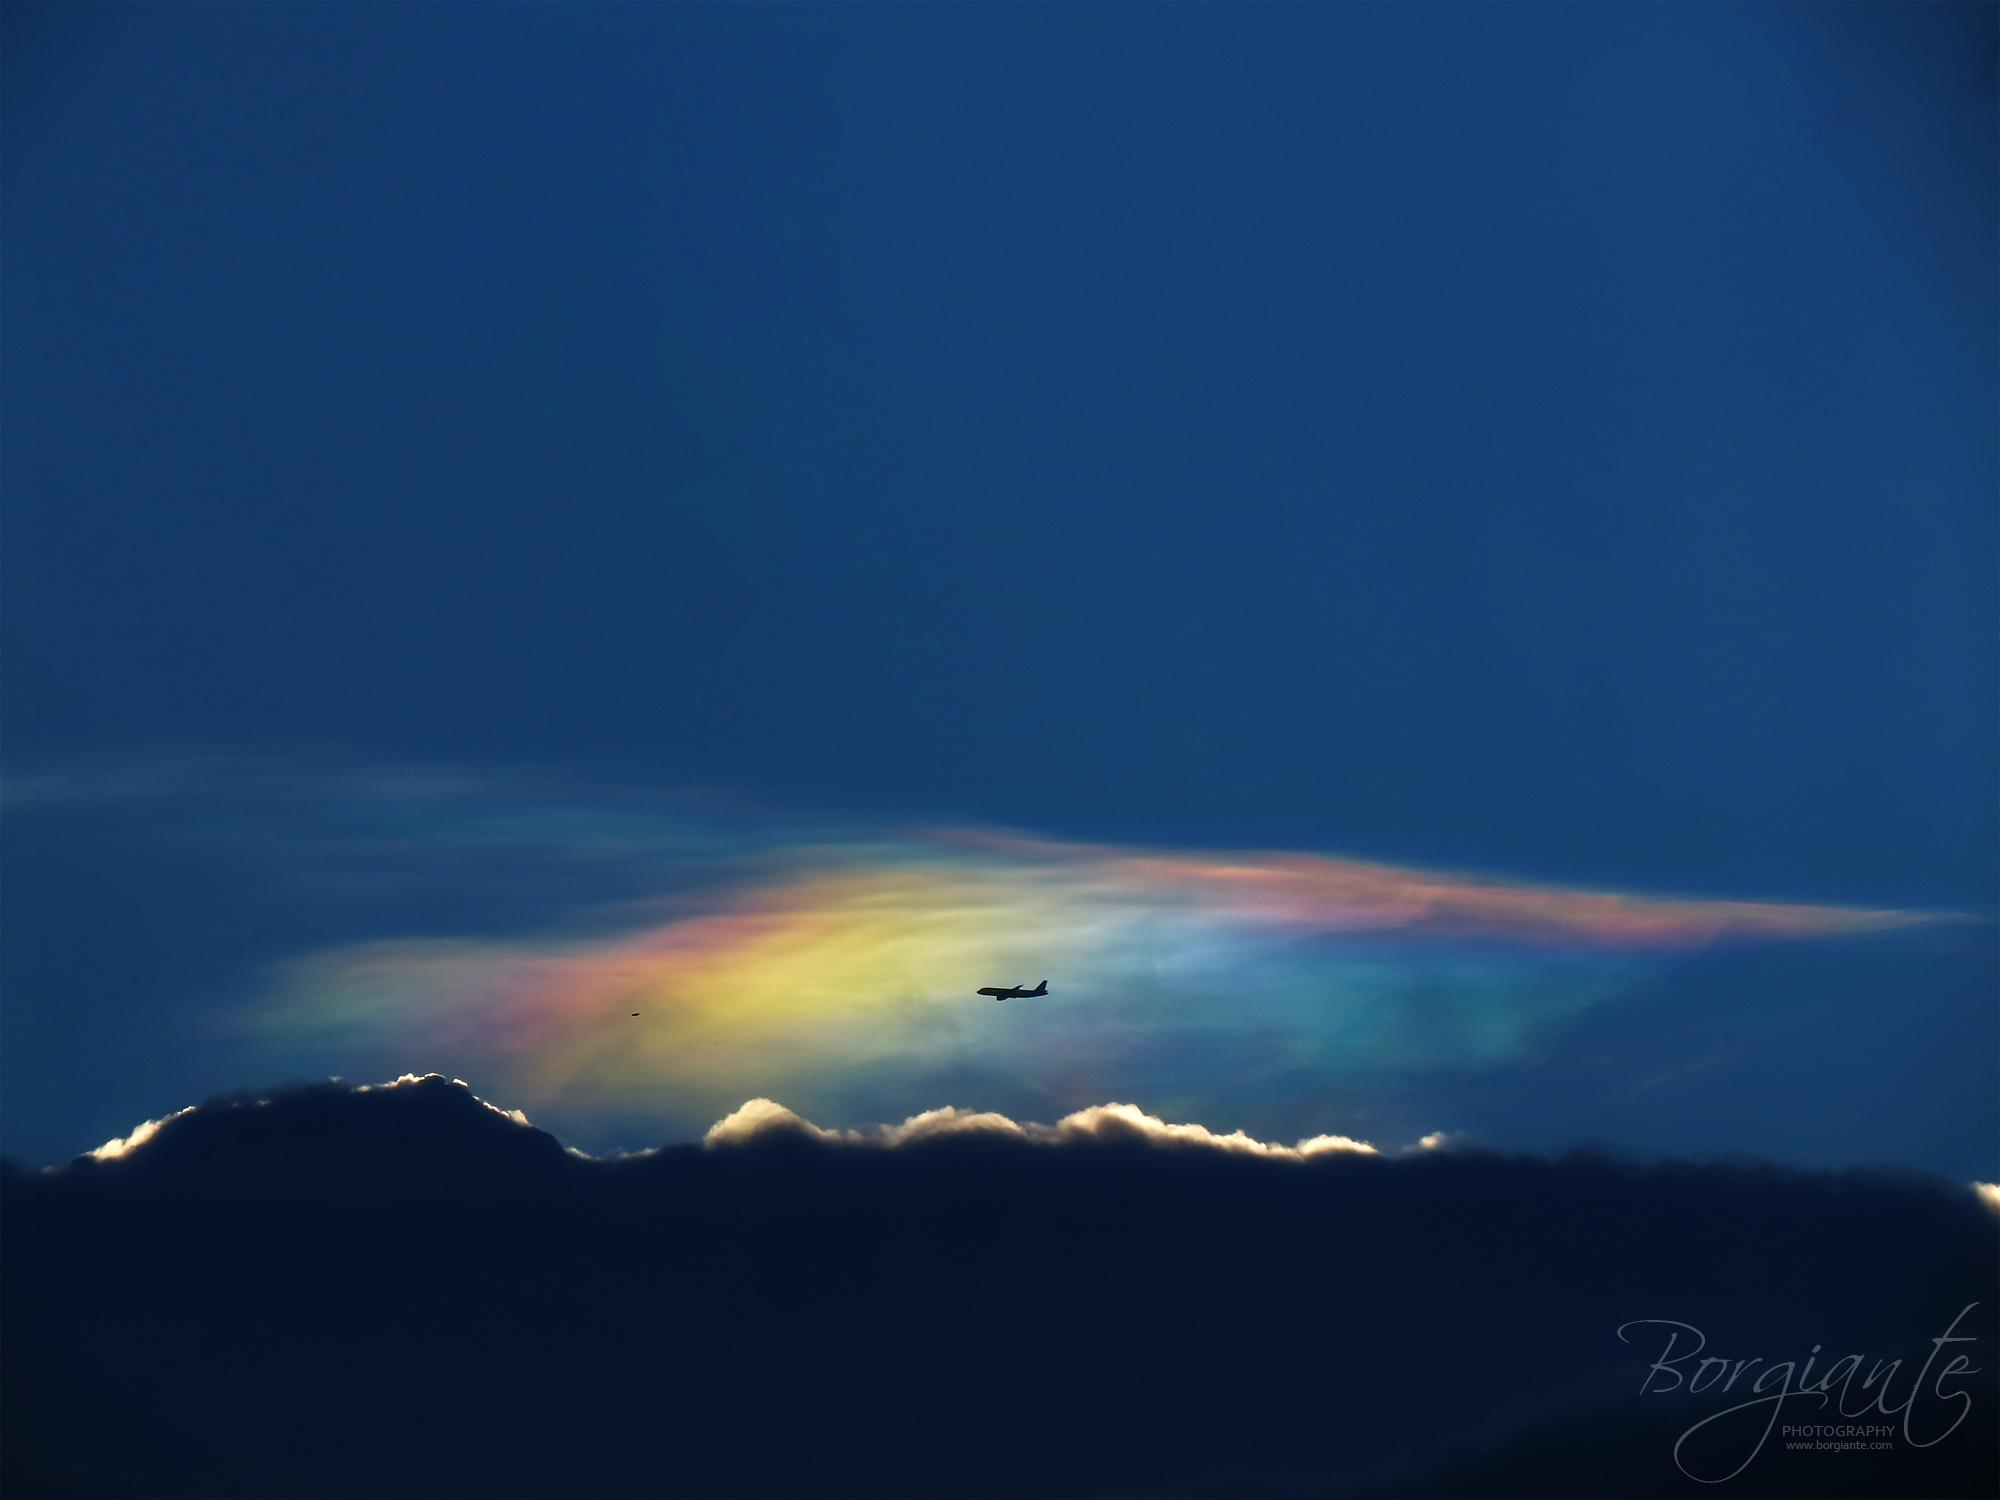 Day 57 (Iridescent clouds) by emmanuelborja